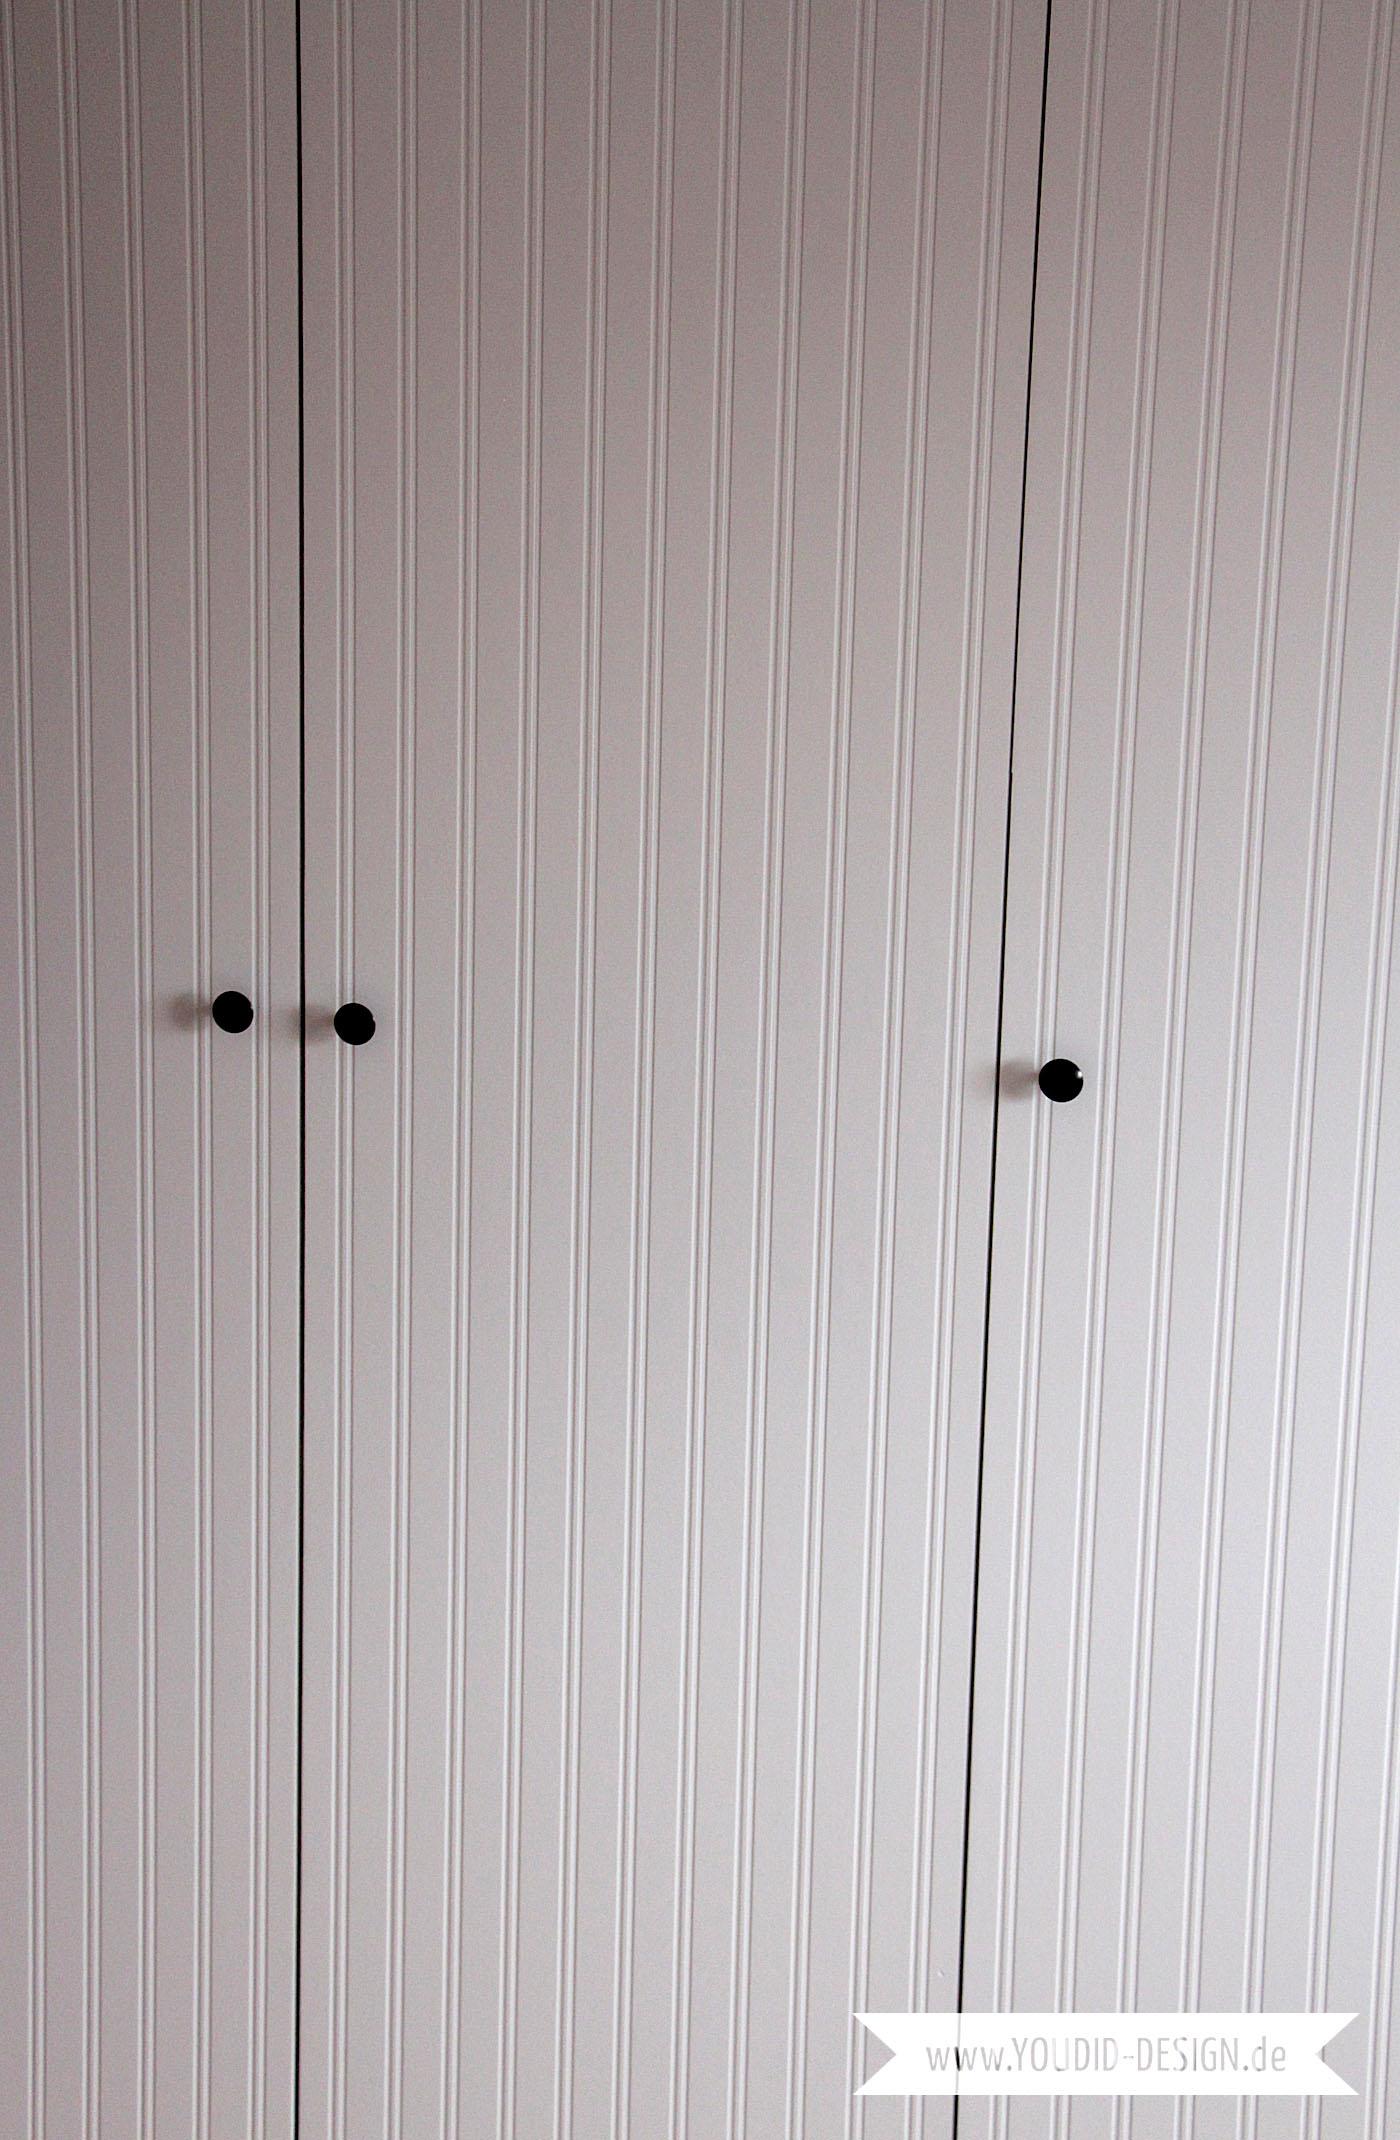 Ikea Hack Pax Kleiderschrank Makeover Mit Beadboard Wallpaper